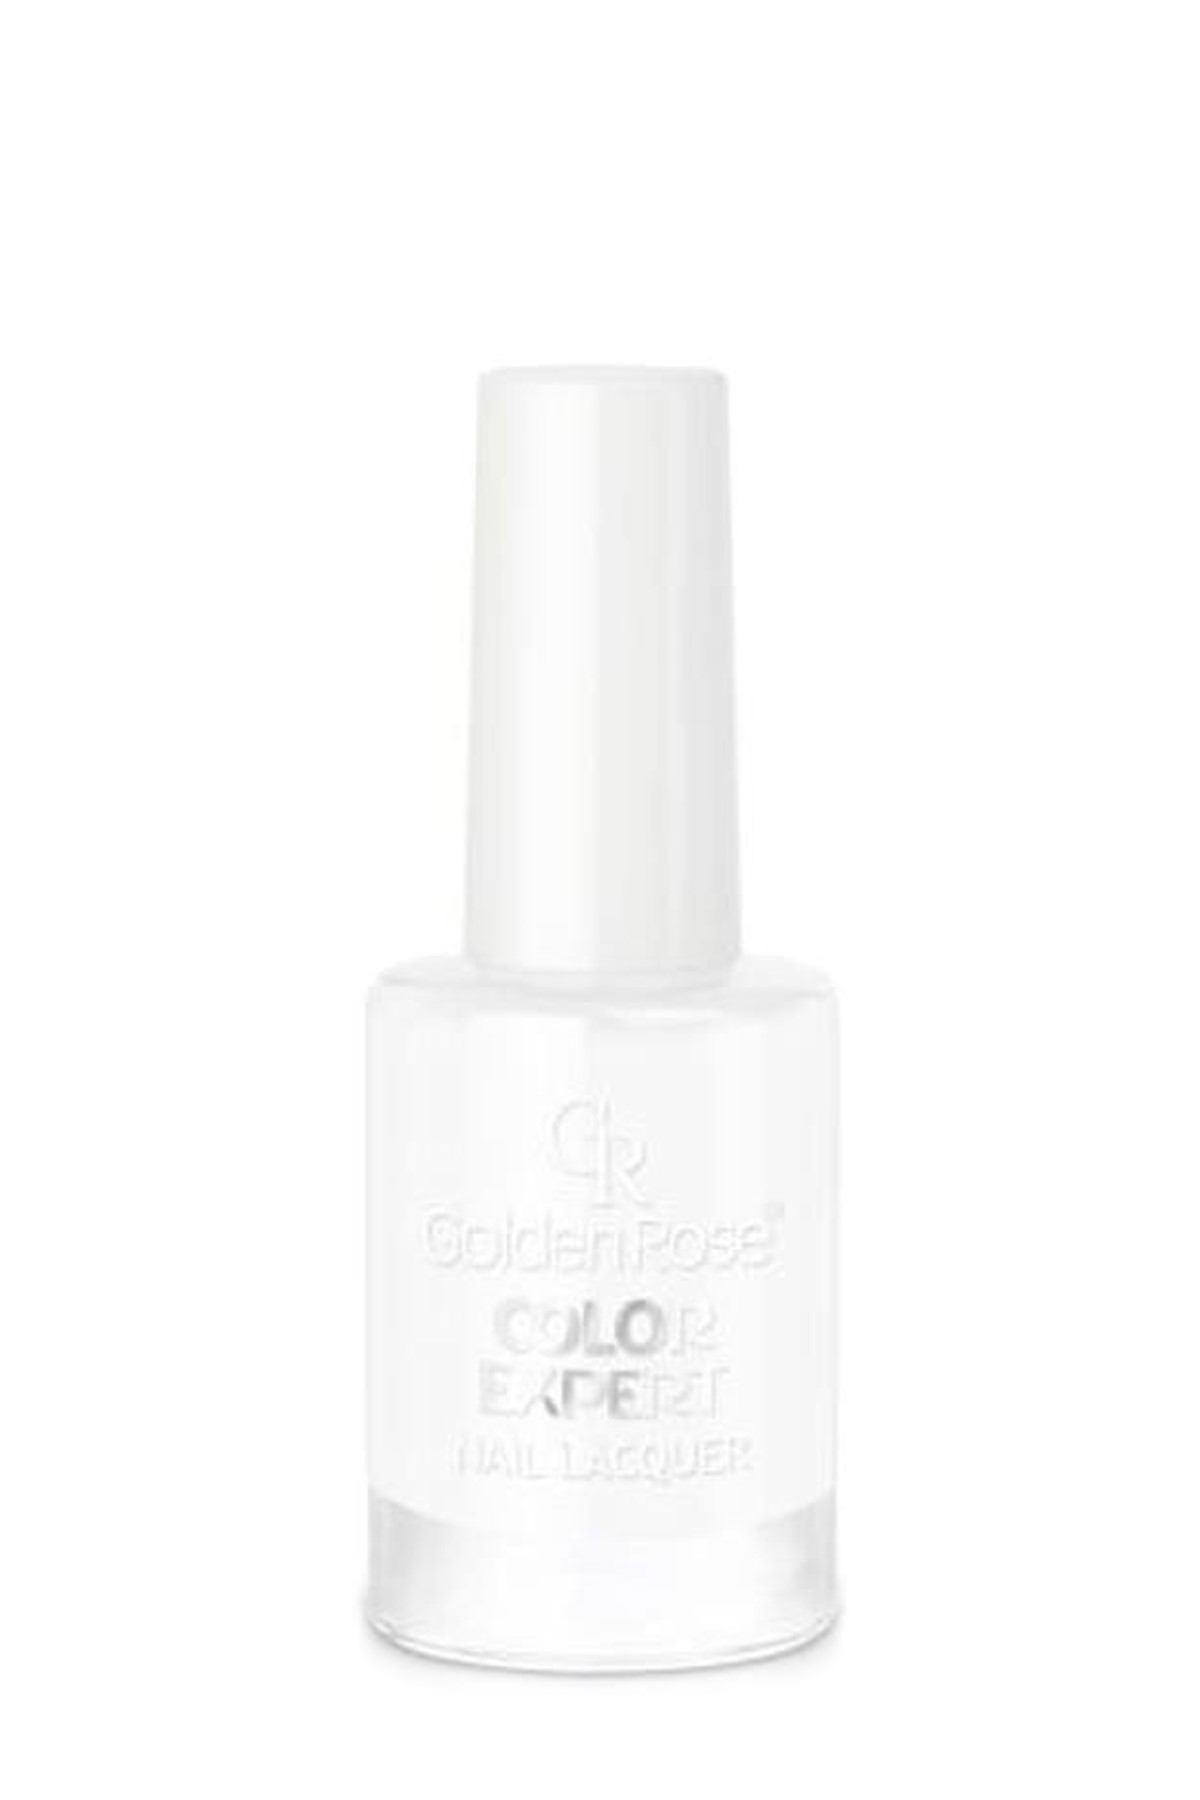 Golden Rose Oje - Color Expert Nail Lacquer No: 02 8691190703028 1